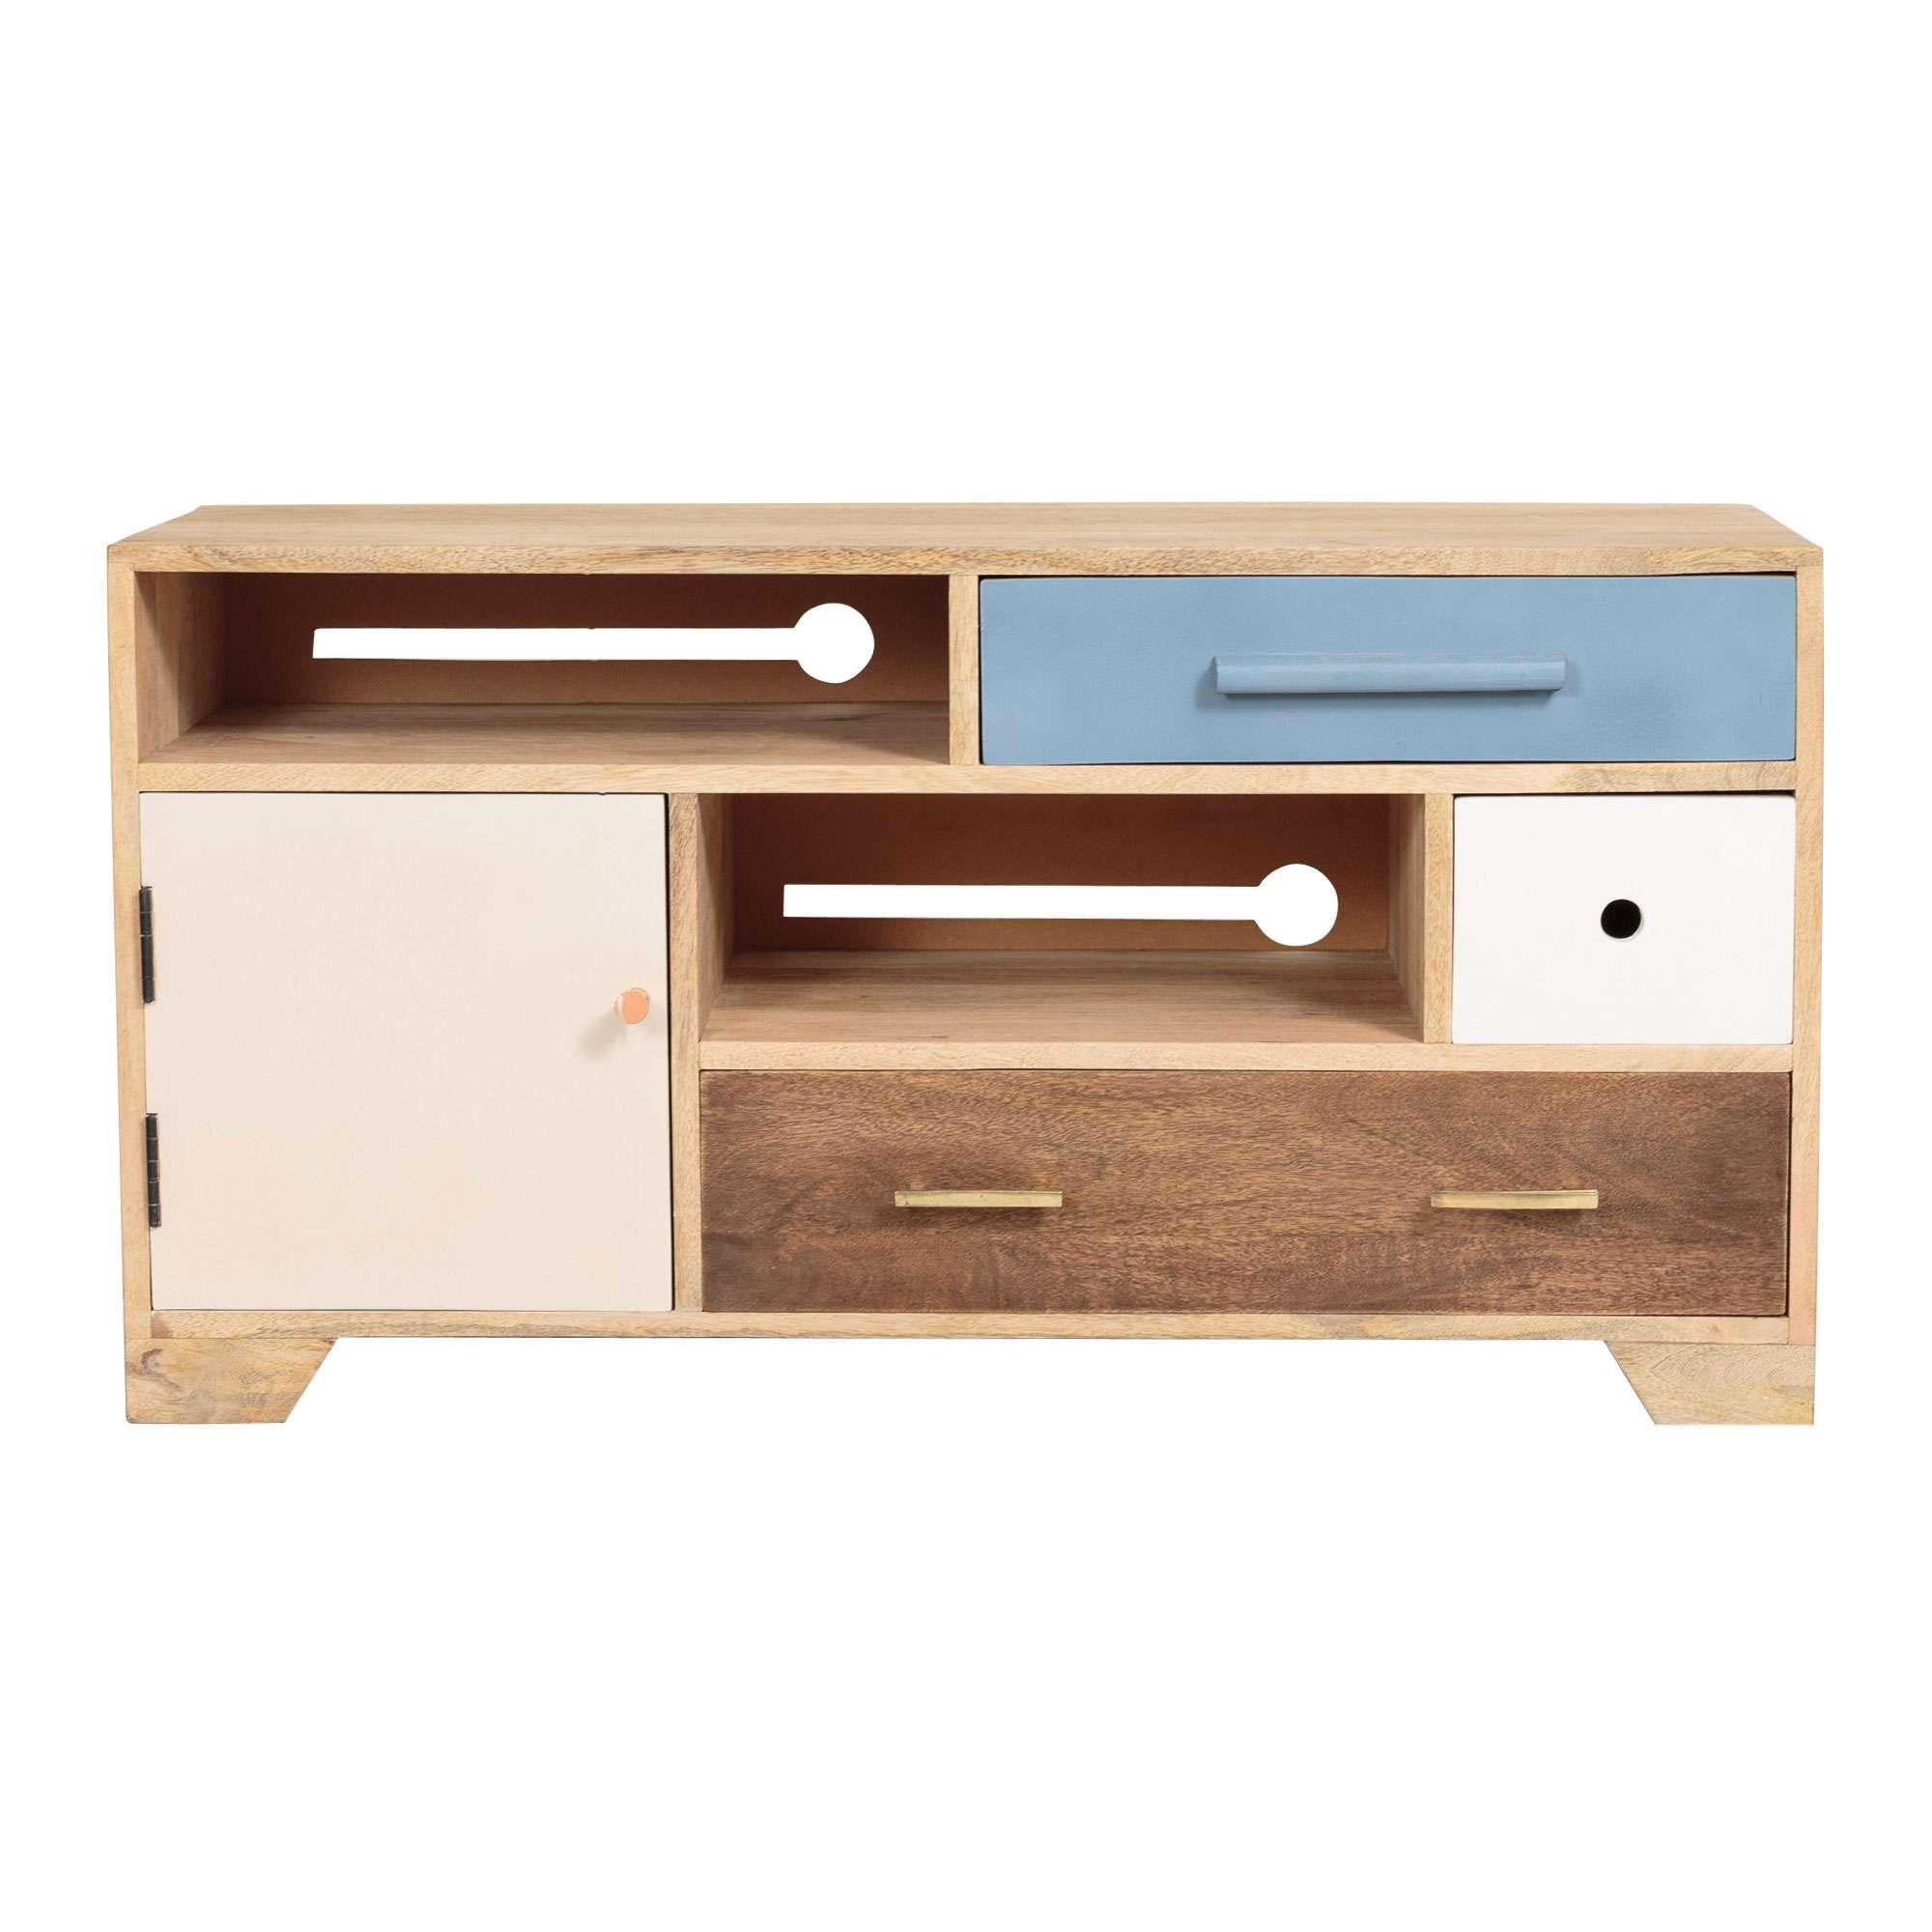 Storage & Shelving | Furniture | Oliver Bonas | Oliver Bonas For Funky Tv Cabinets (View 20 of 20)